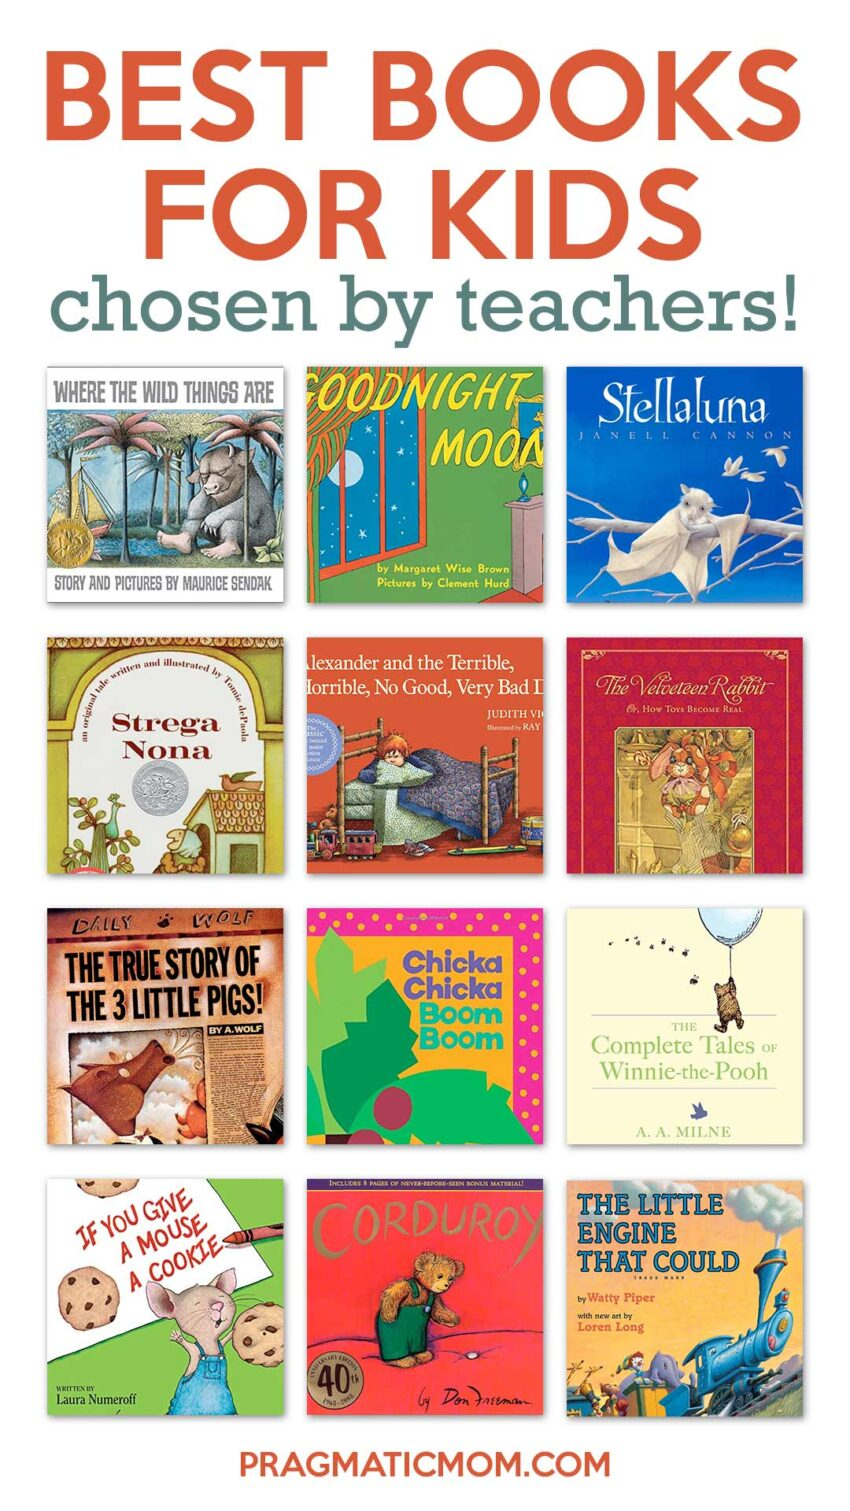 Best Books for Kids by Teachers